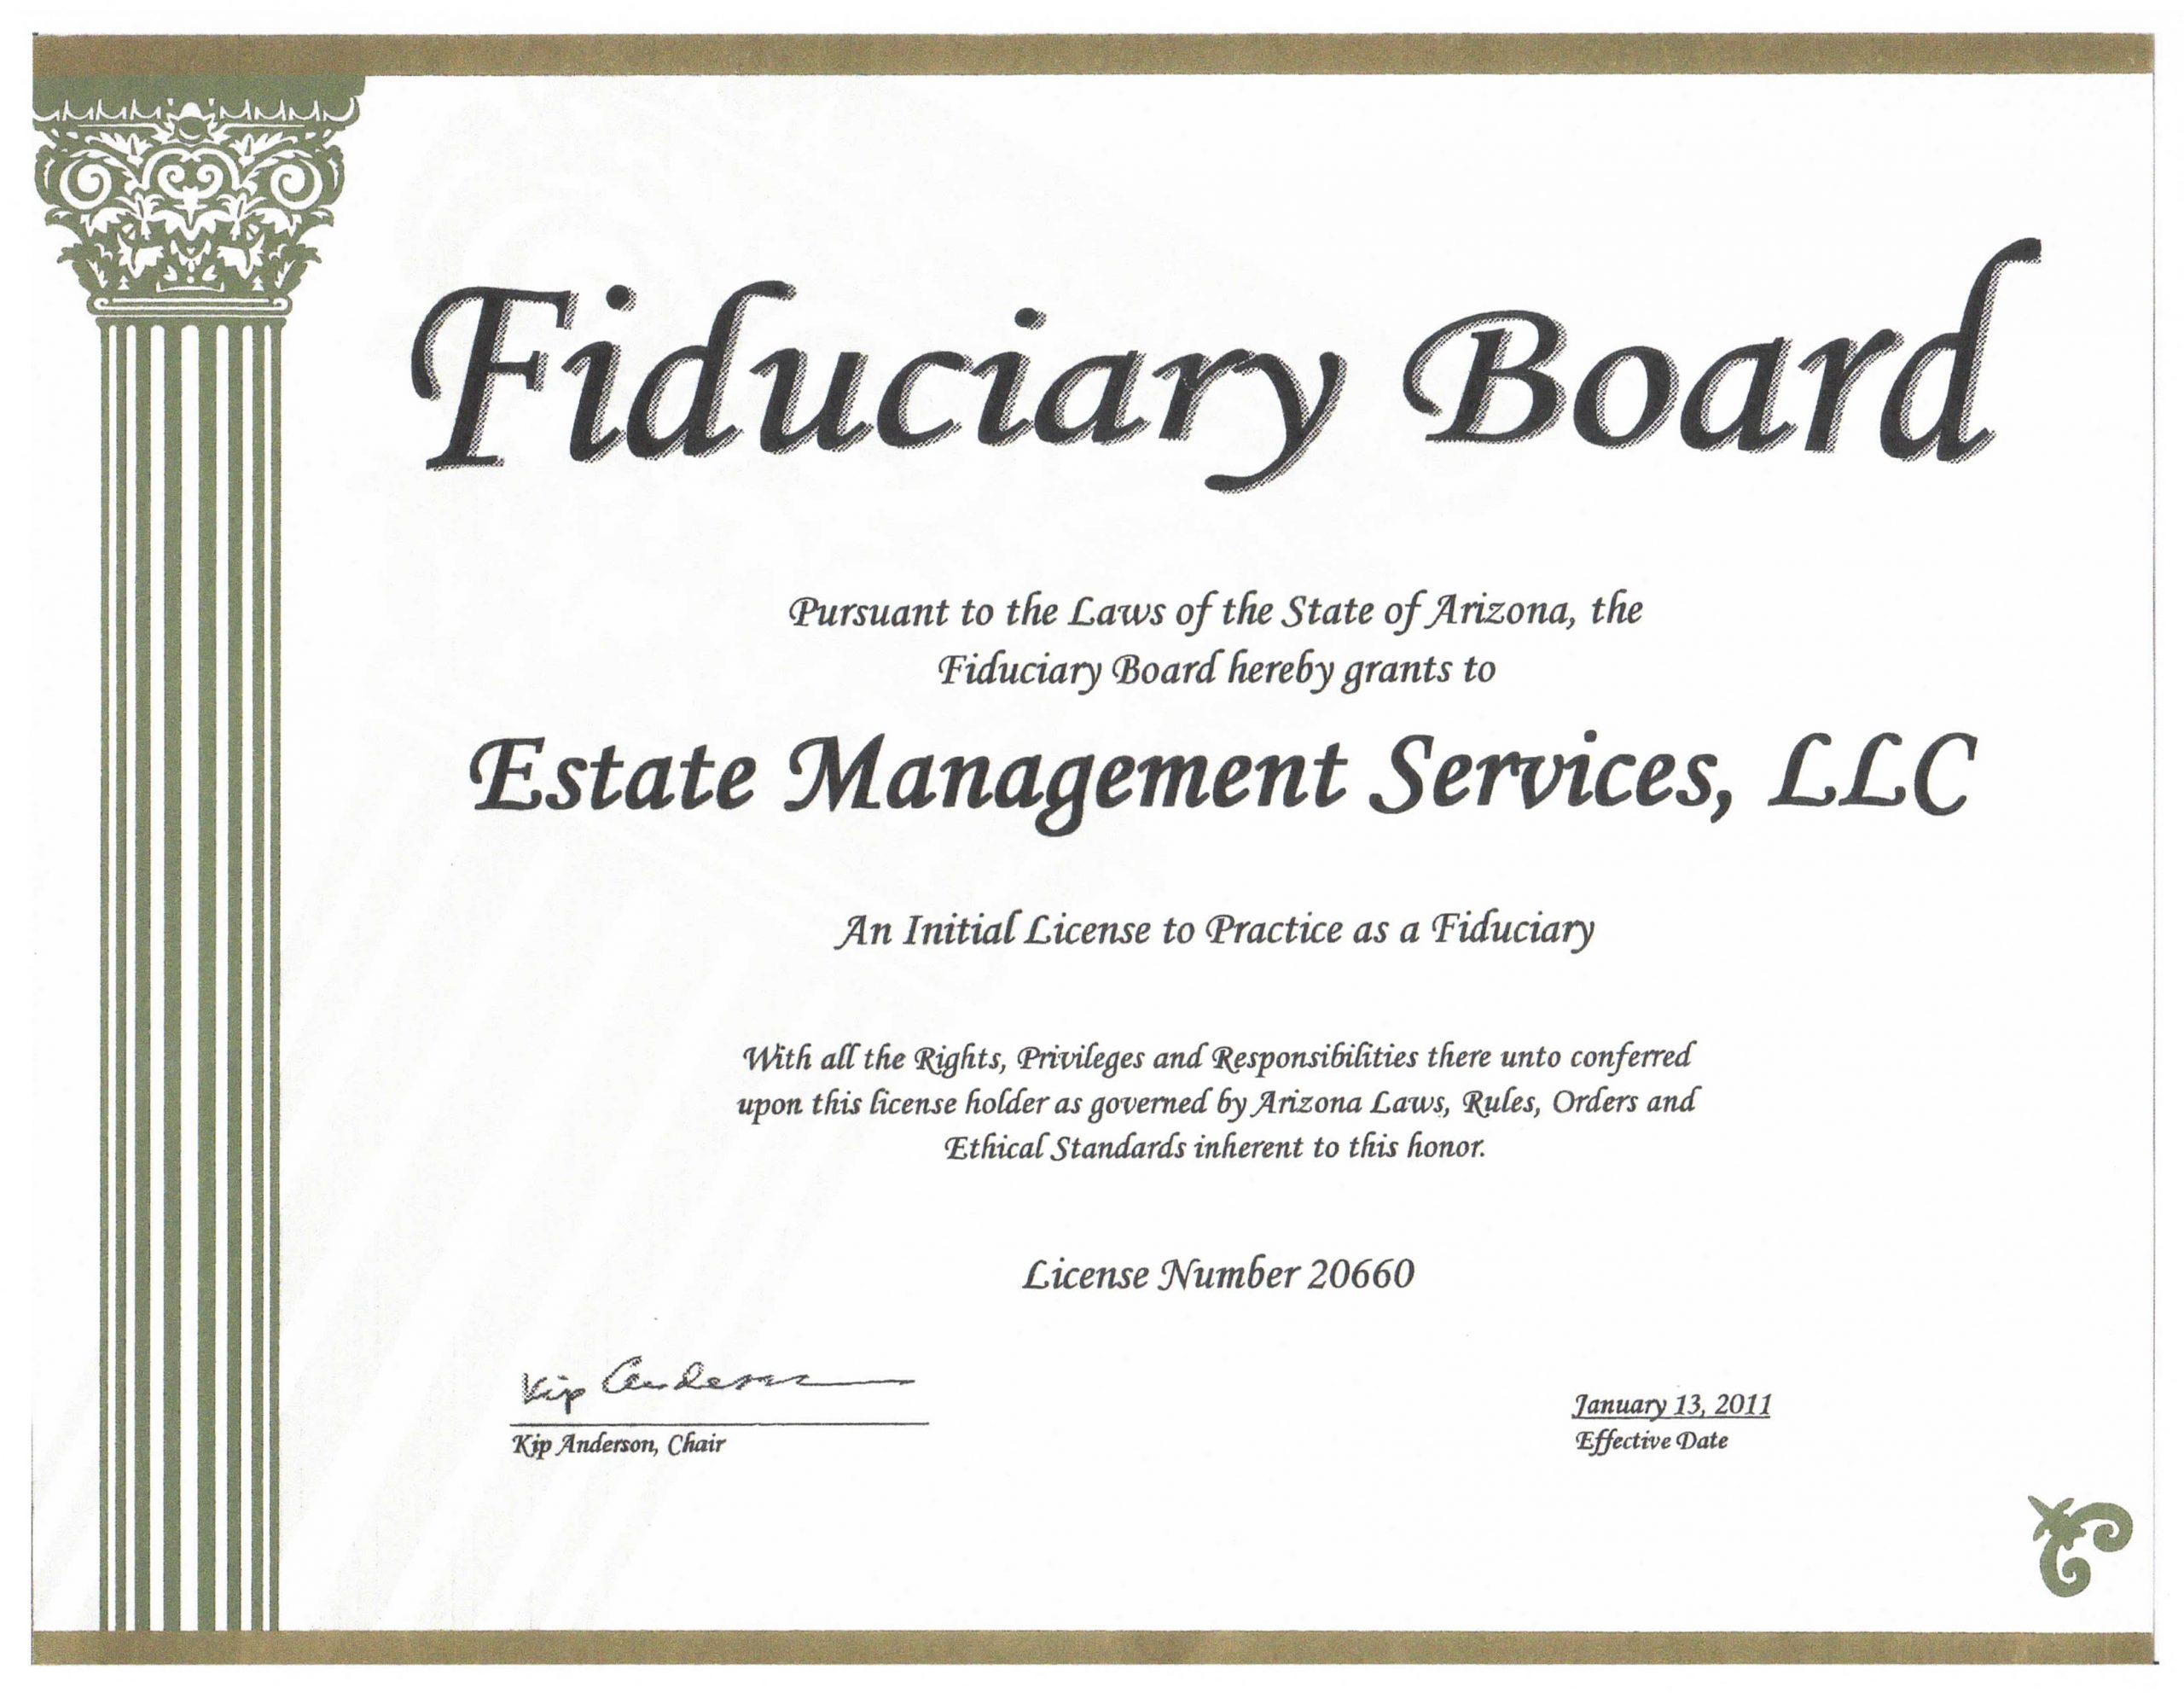 Fiduciary License